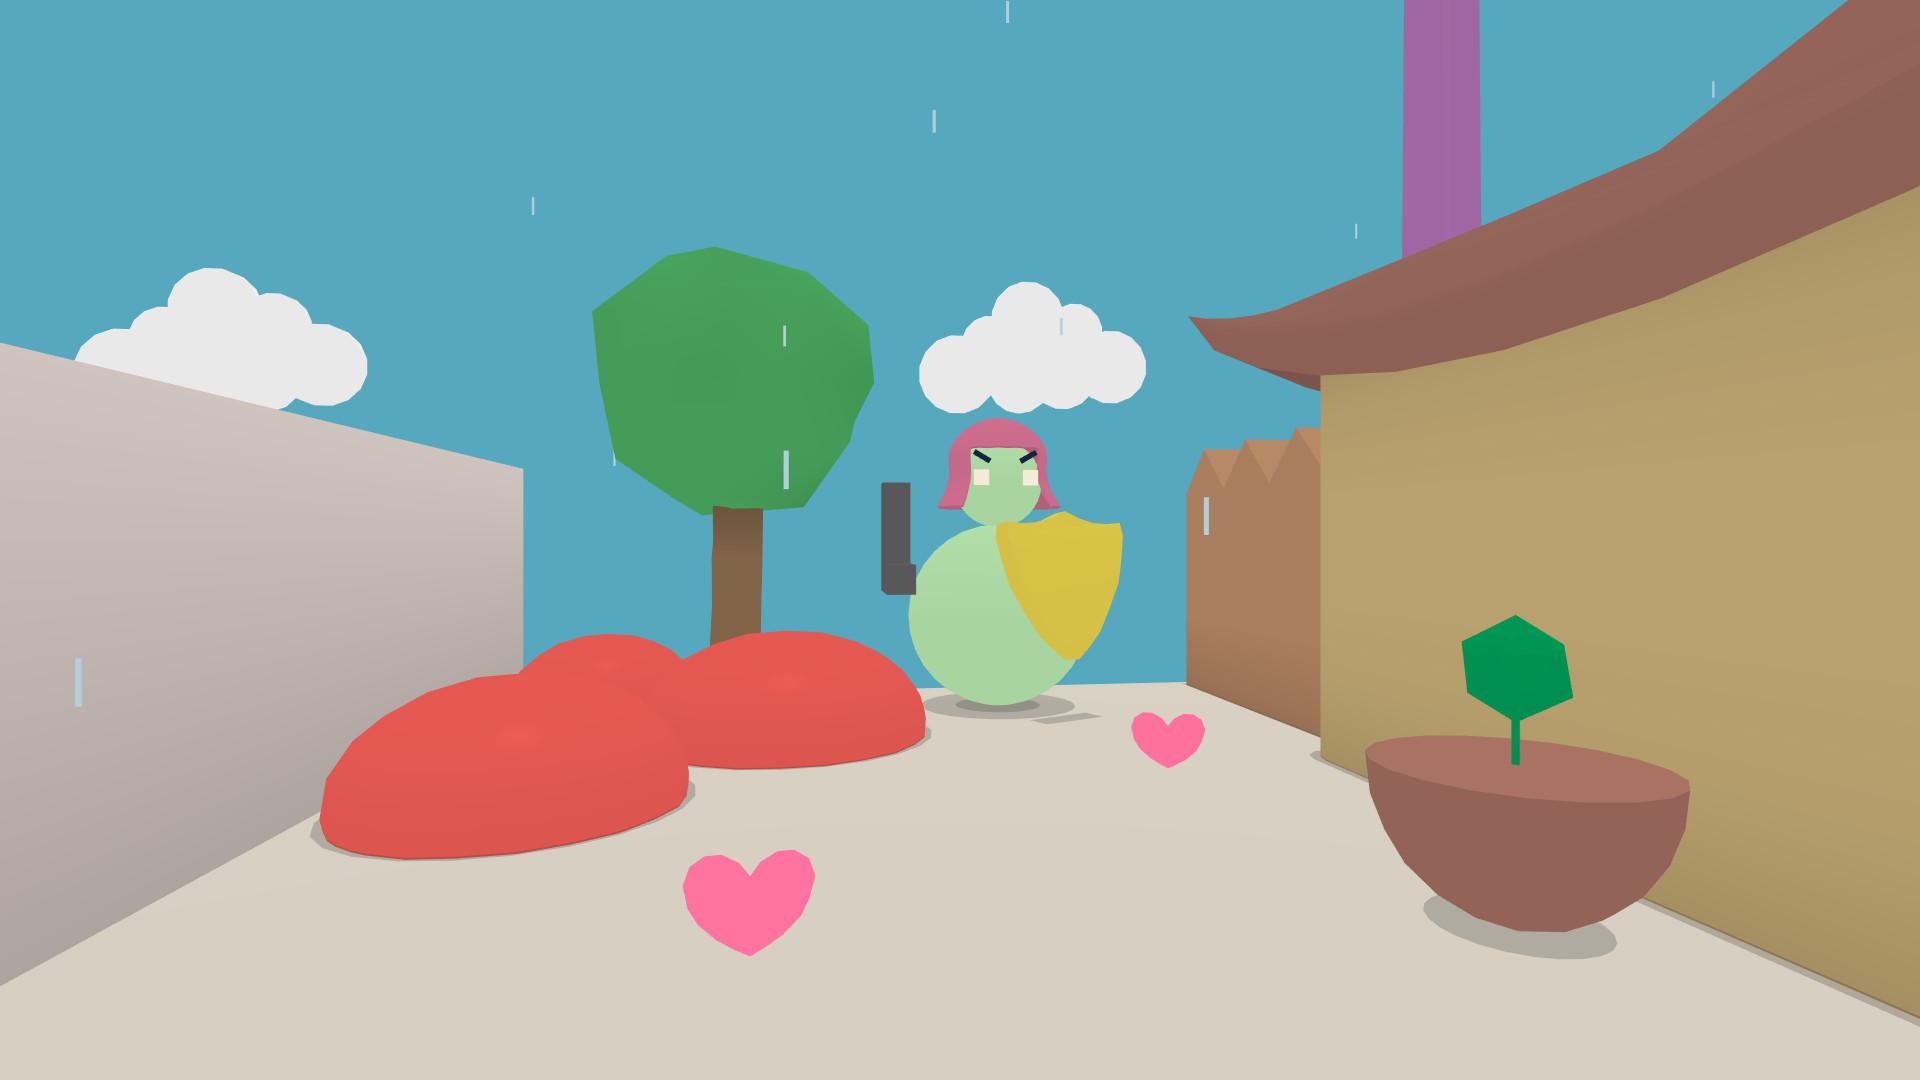 LovelyPlanetArcade2